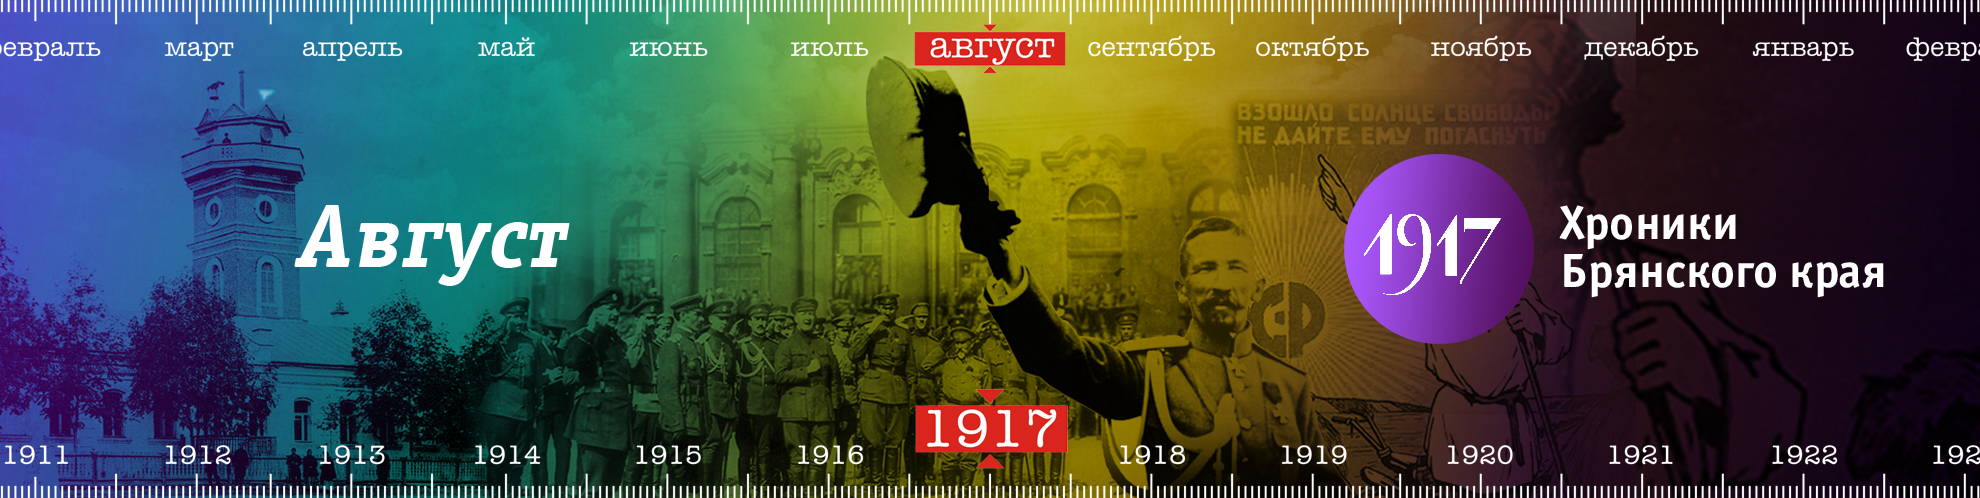 1917. Хроники Брянского края - Август